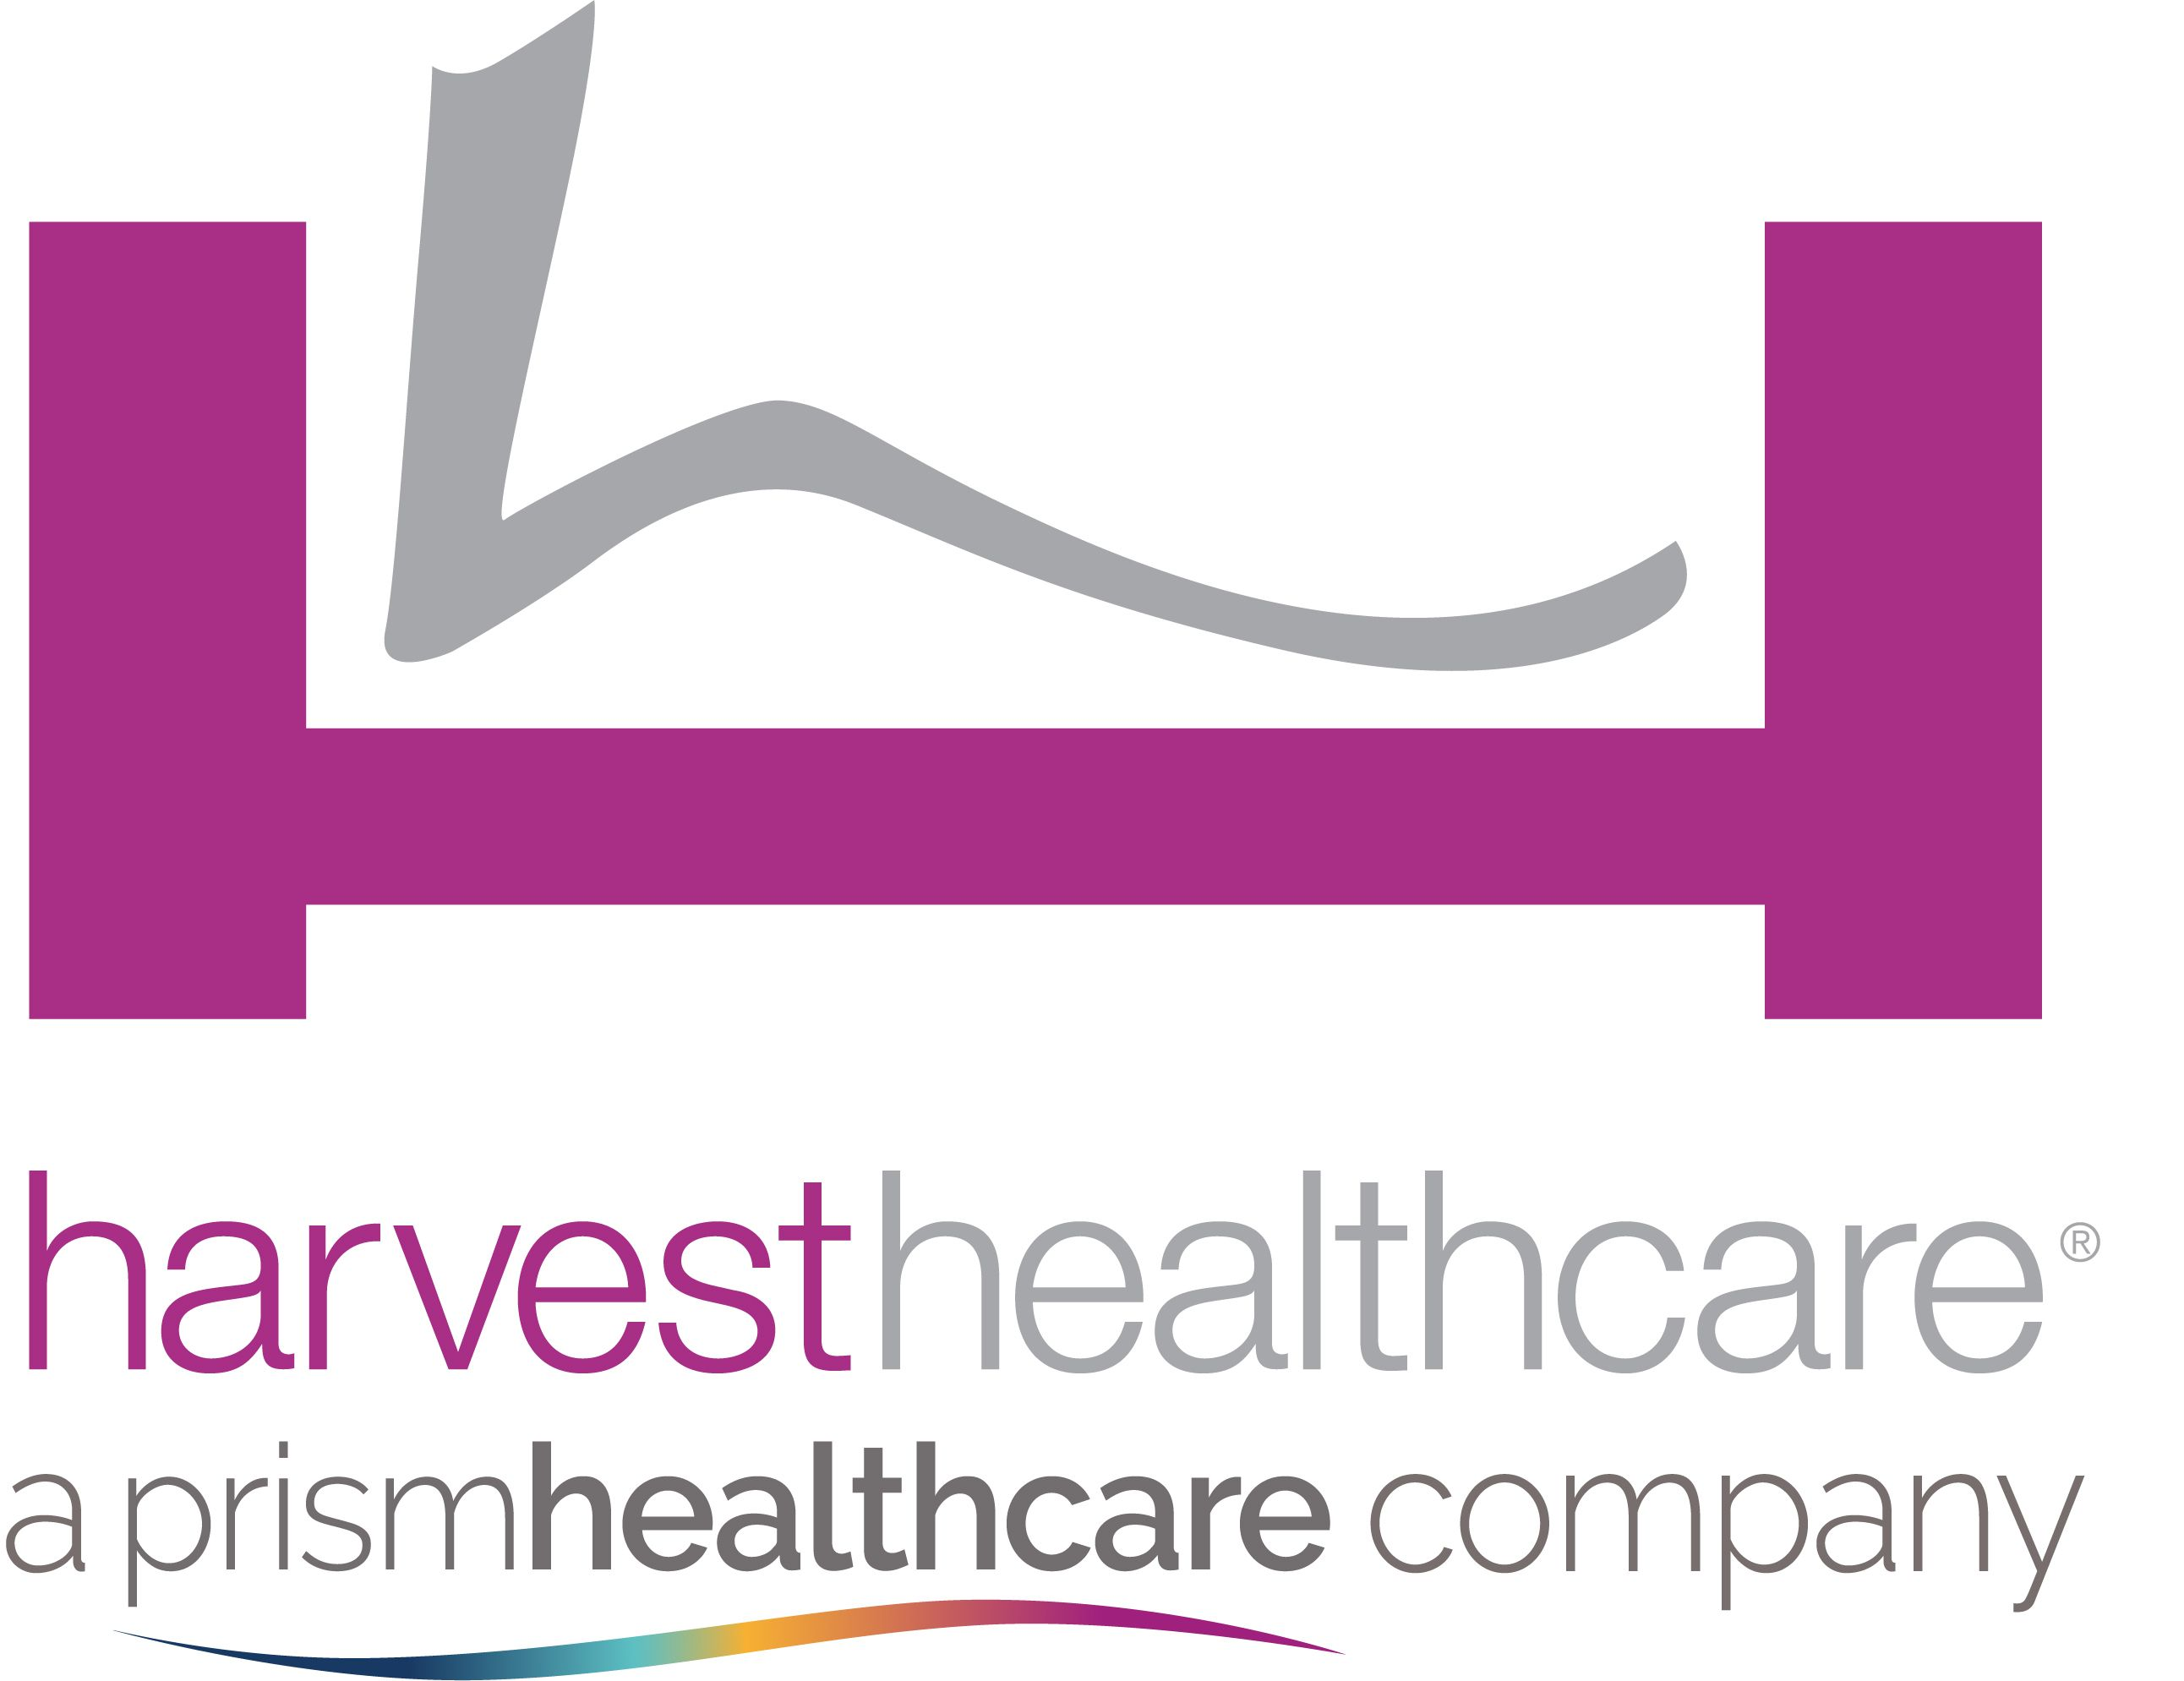 Harvest Healthcare Limited